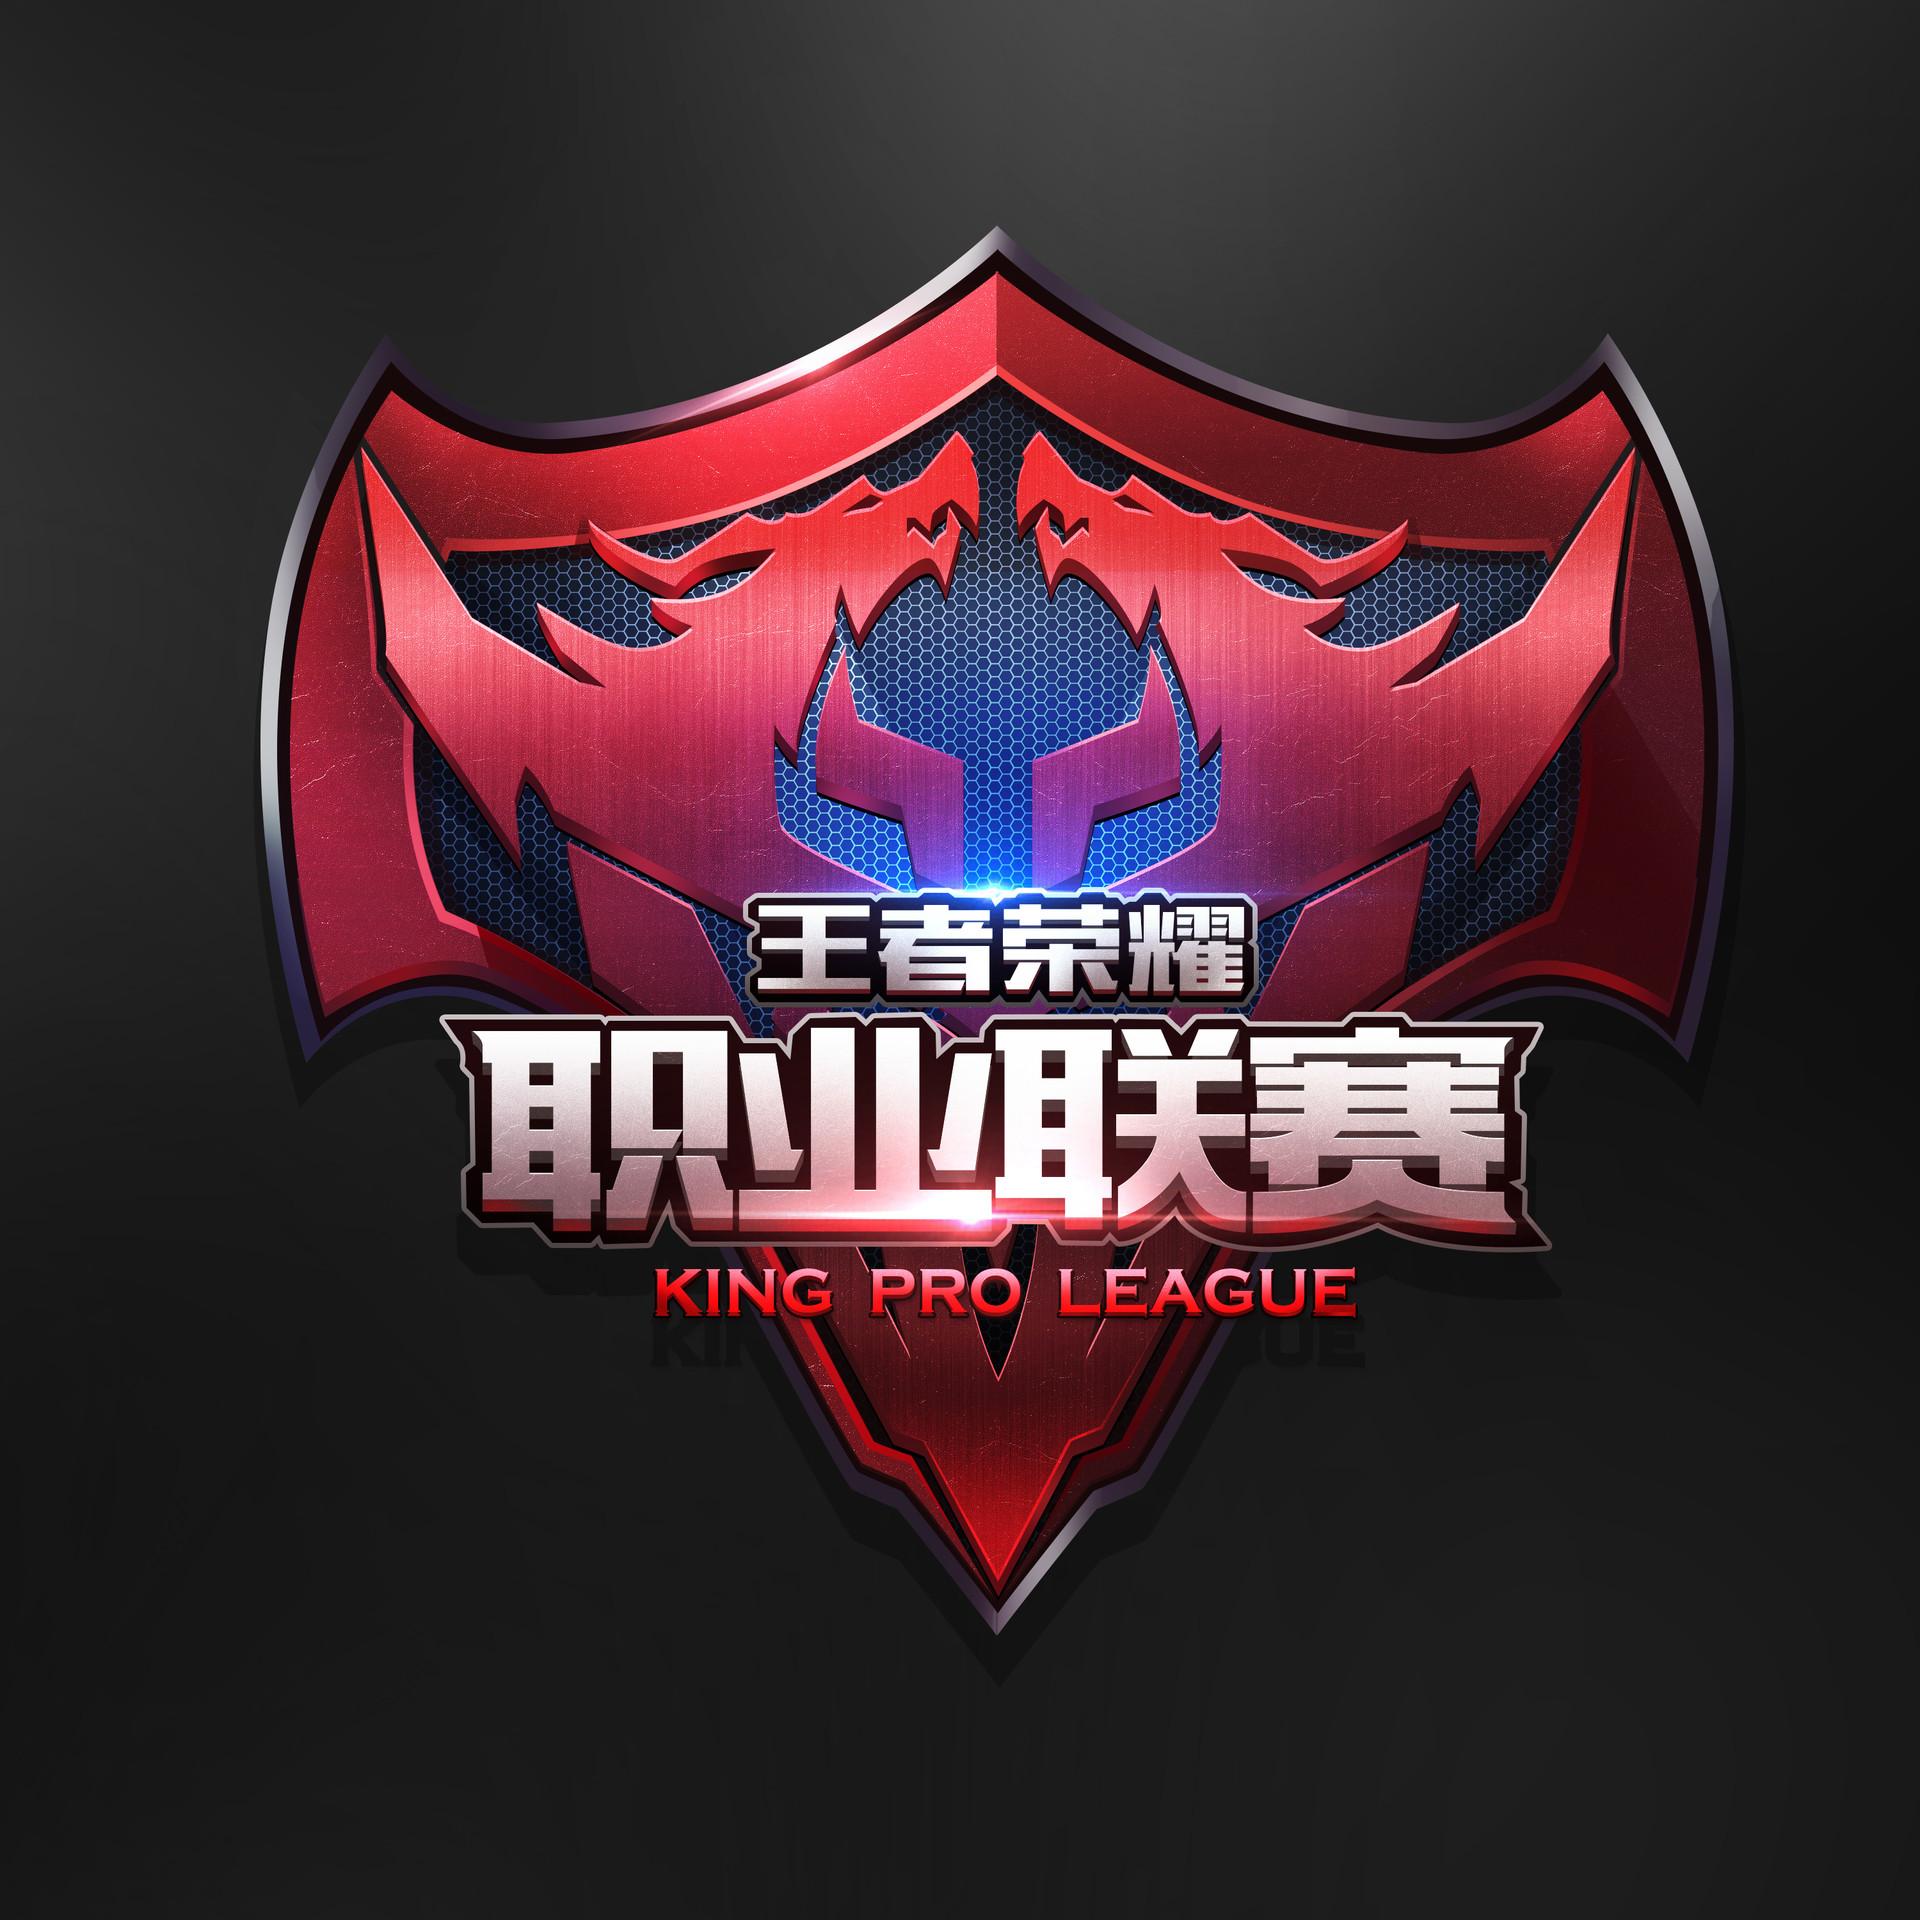 L L Hao 王者荣耀赛事系统logo